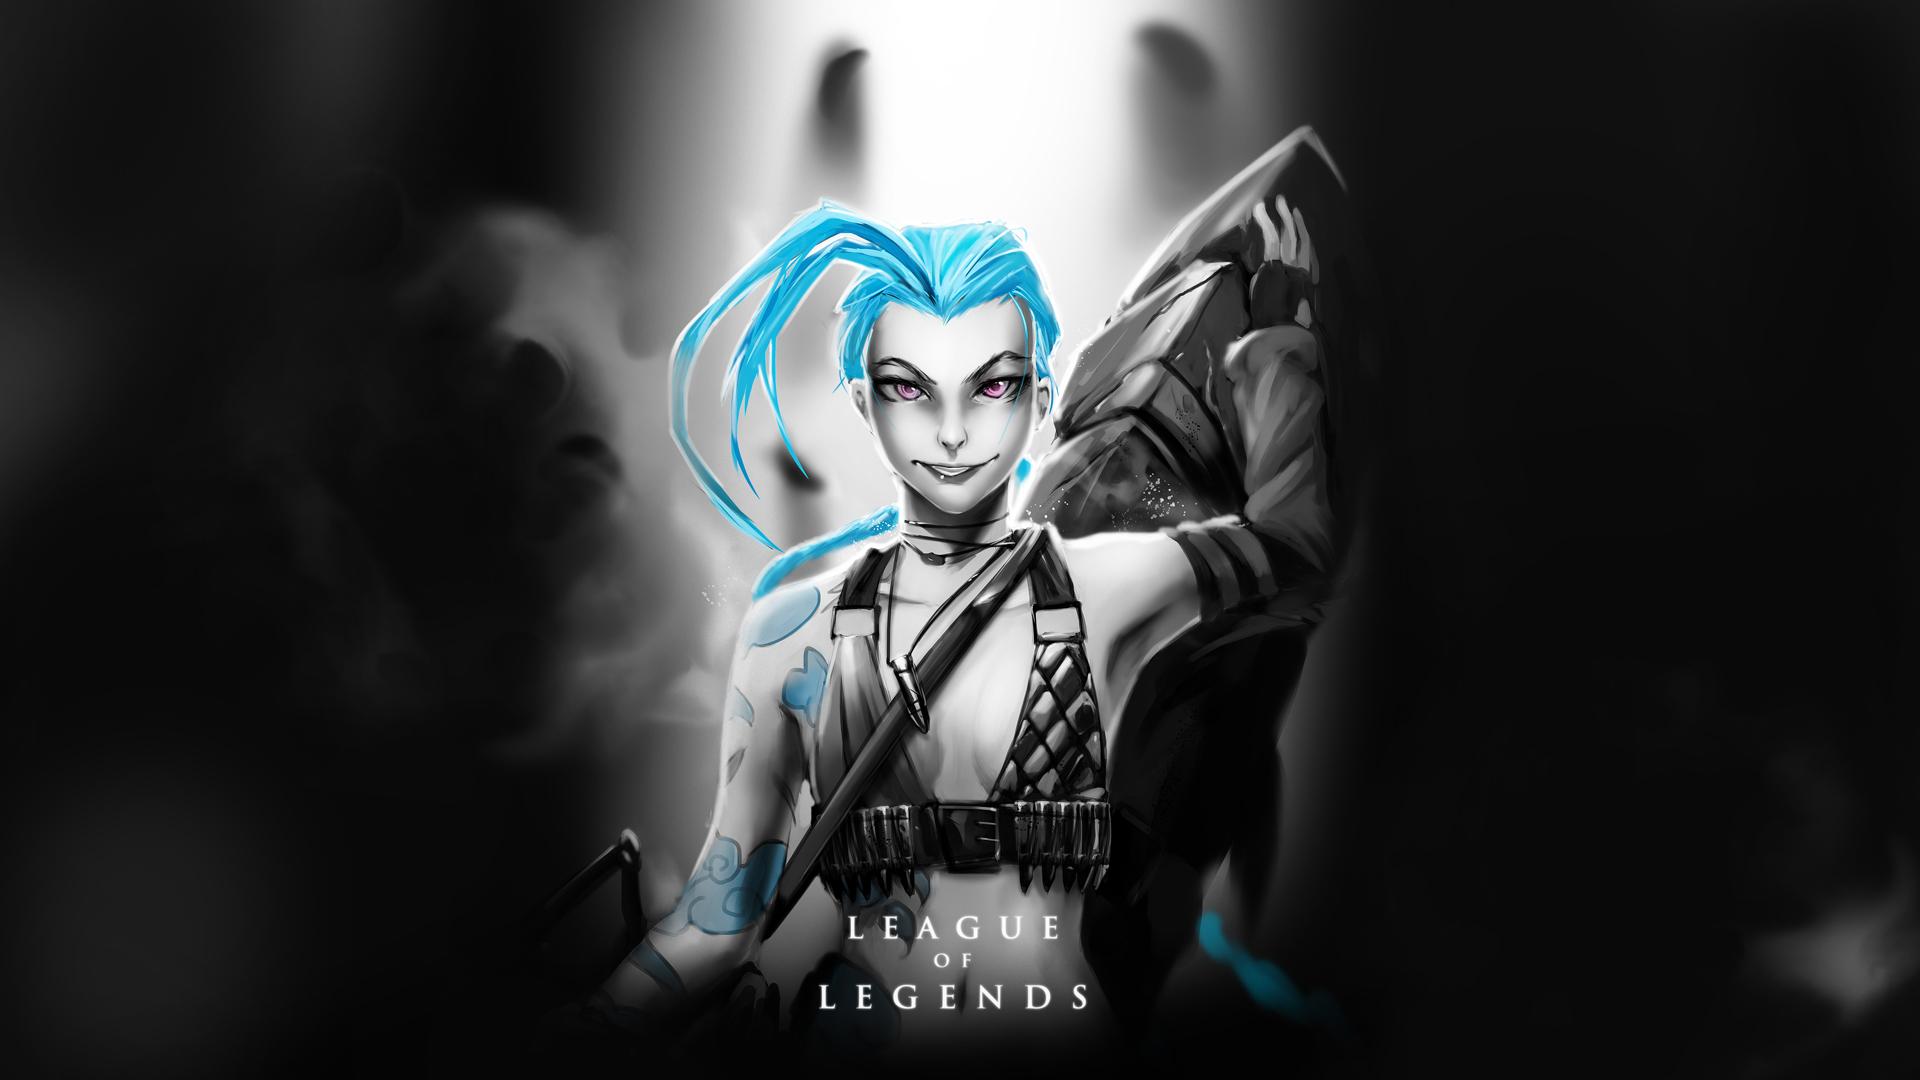 jinx girl art champion league of legends lol 1920x1080